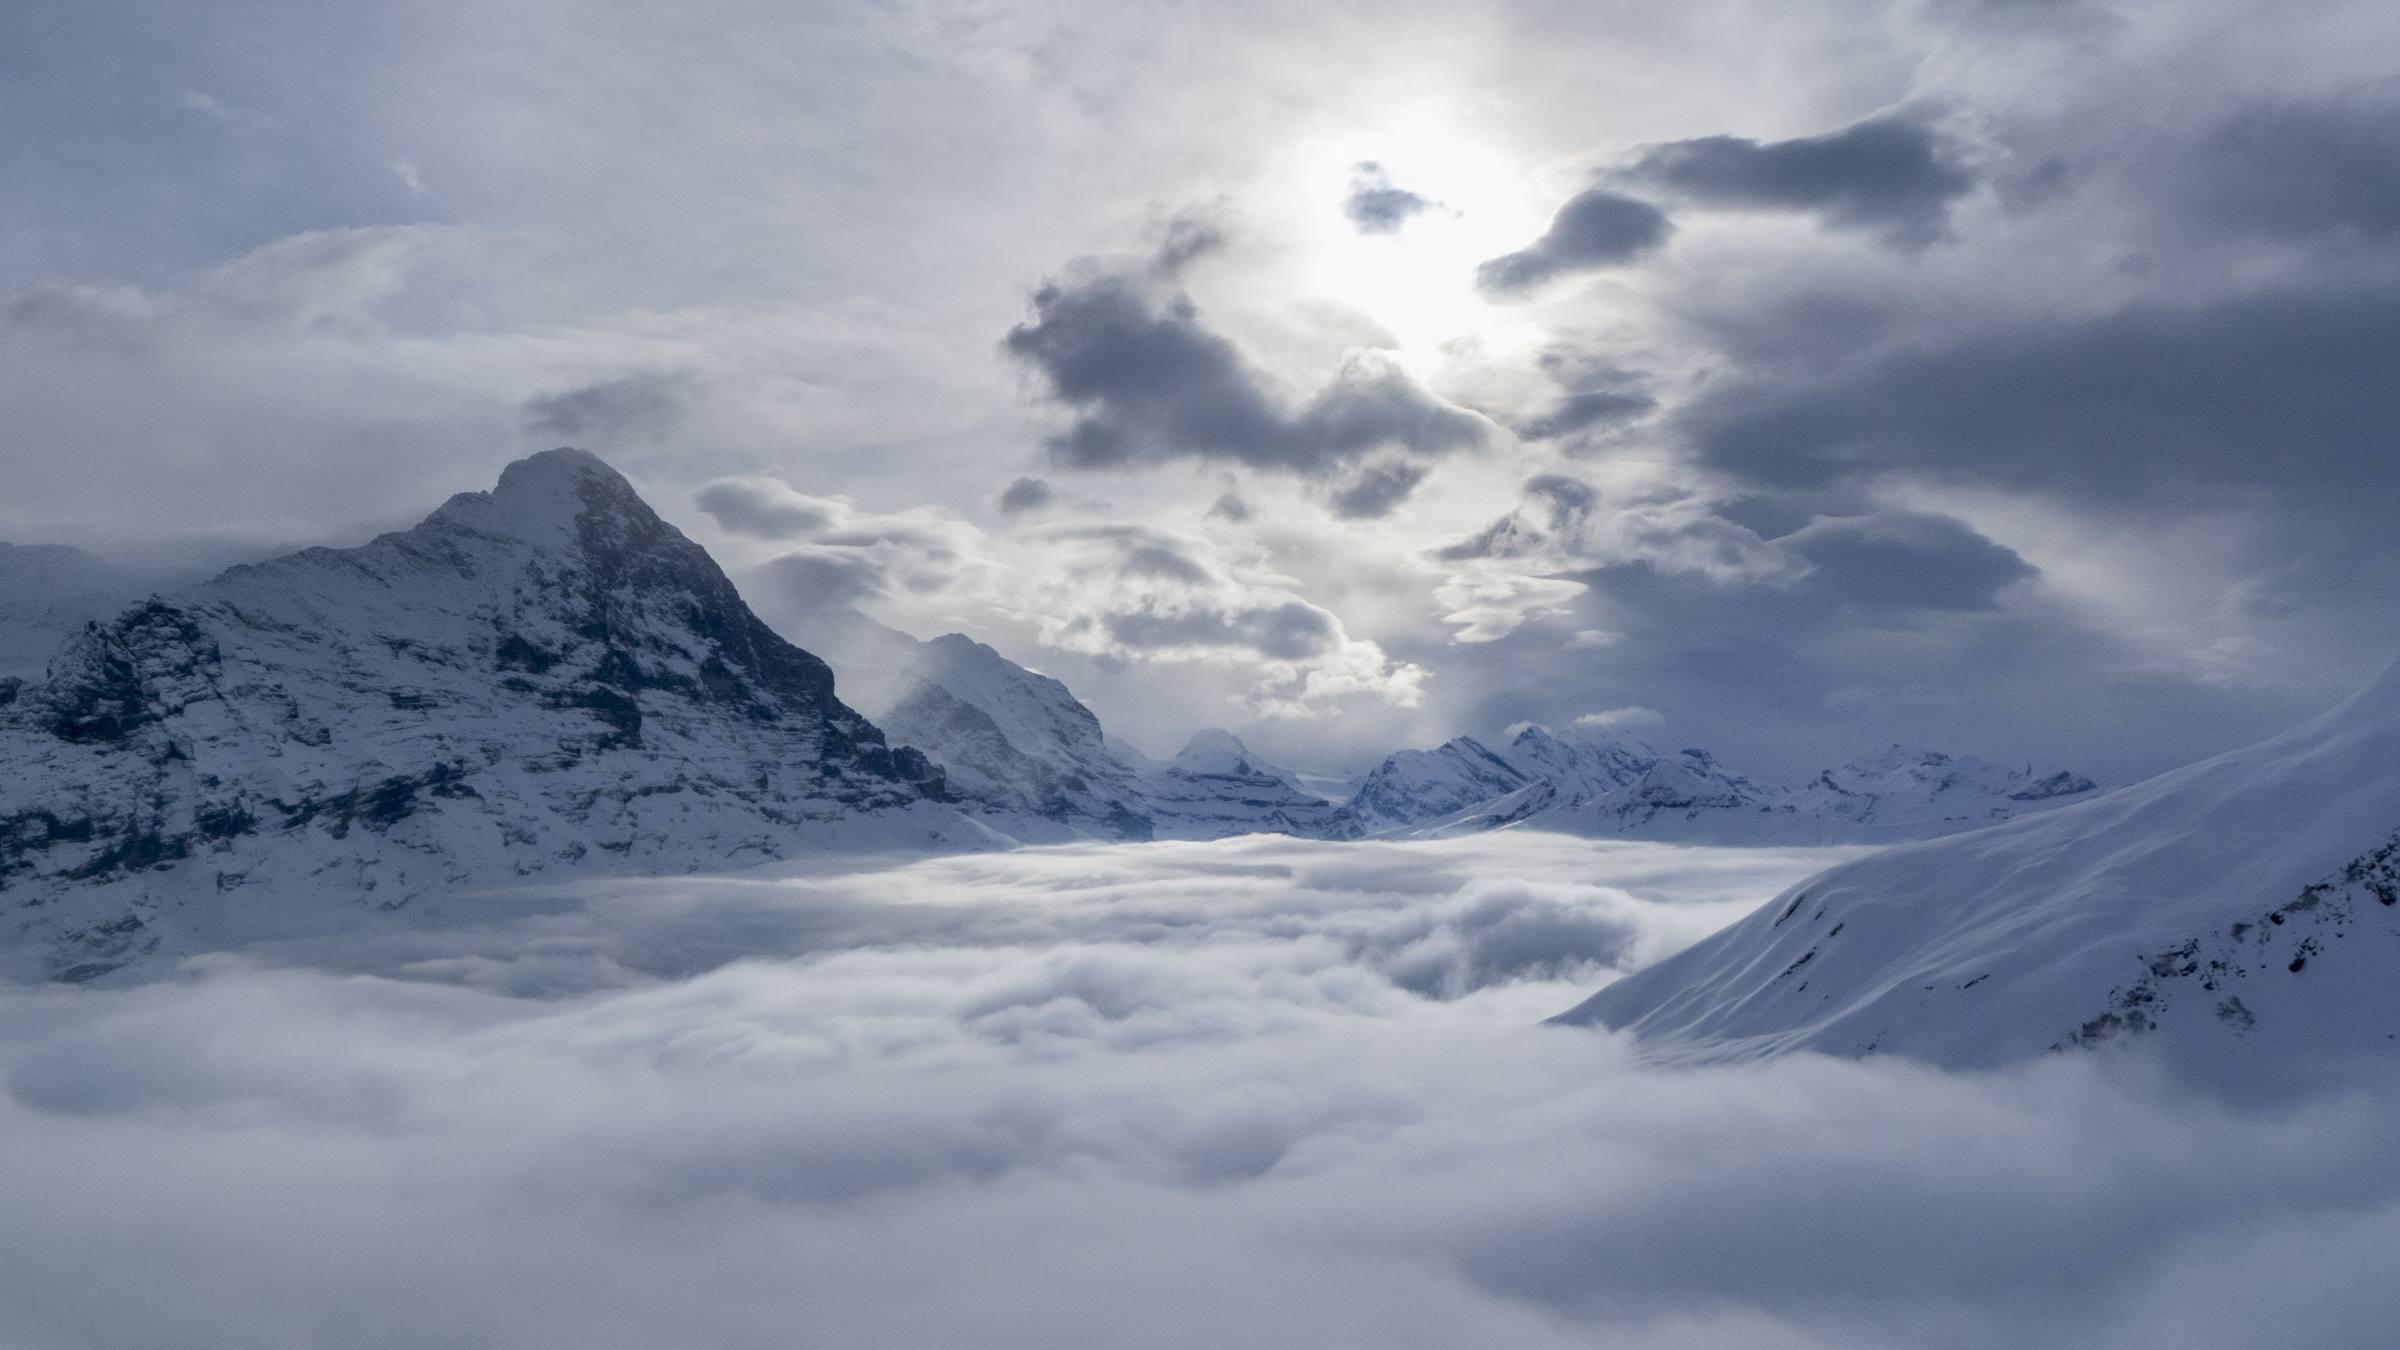 winter alps mountains landscape clouds